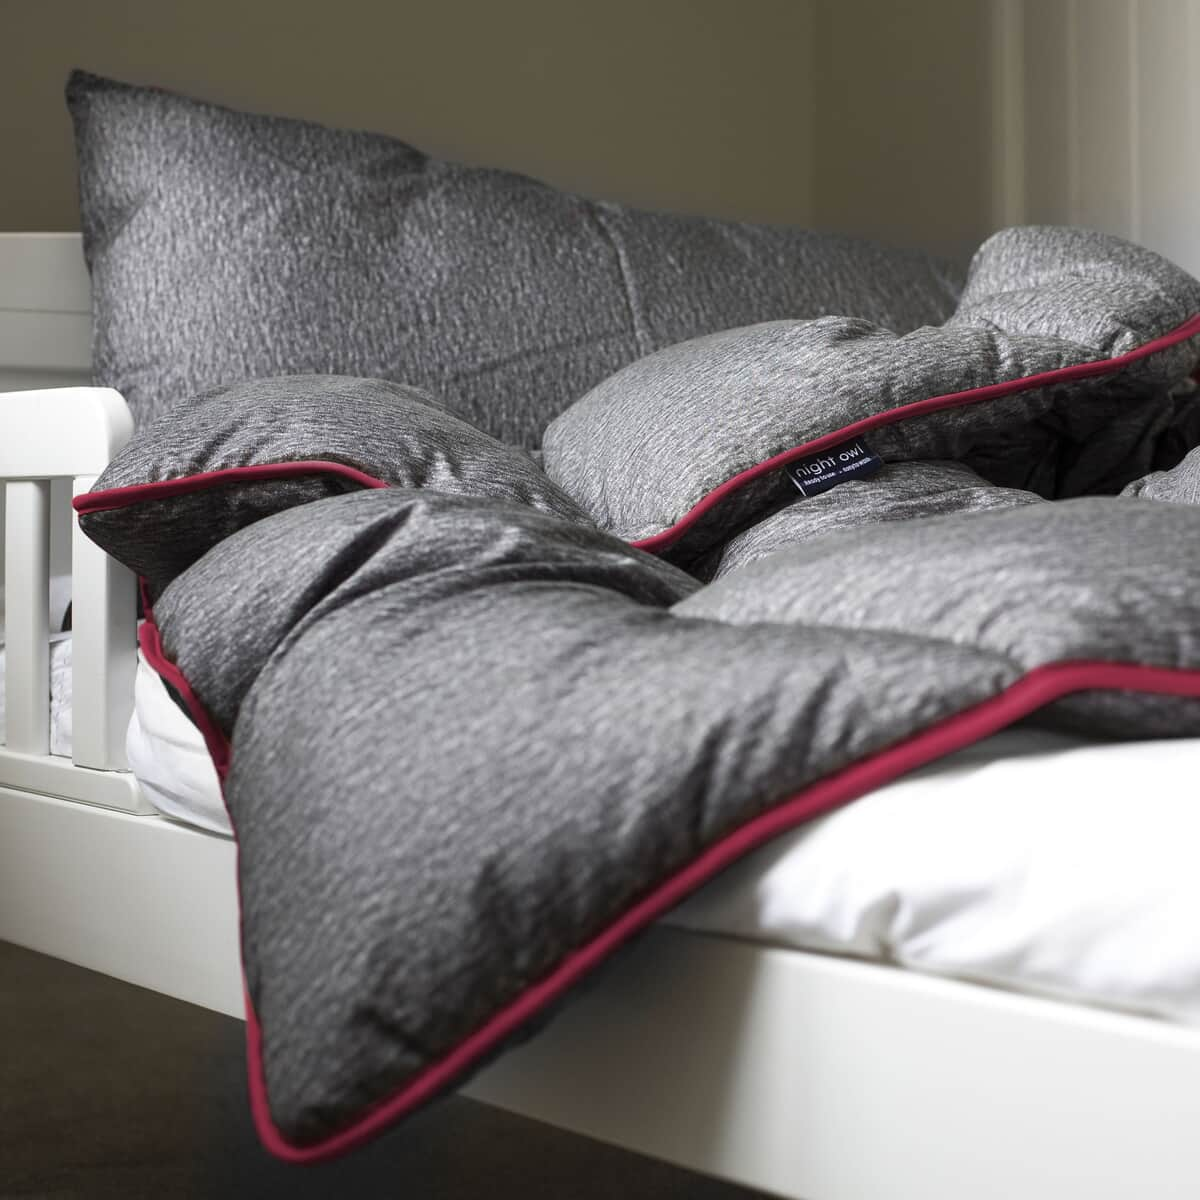 Fine Bedding Co Night Owl Grey/ Pink large